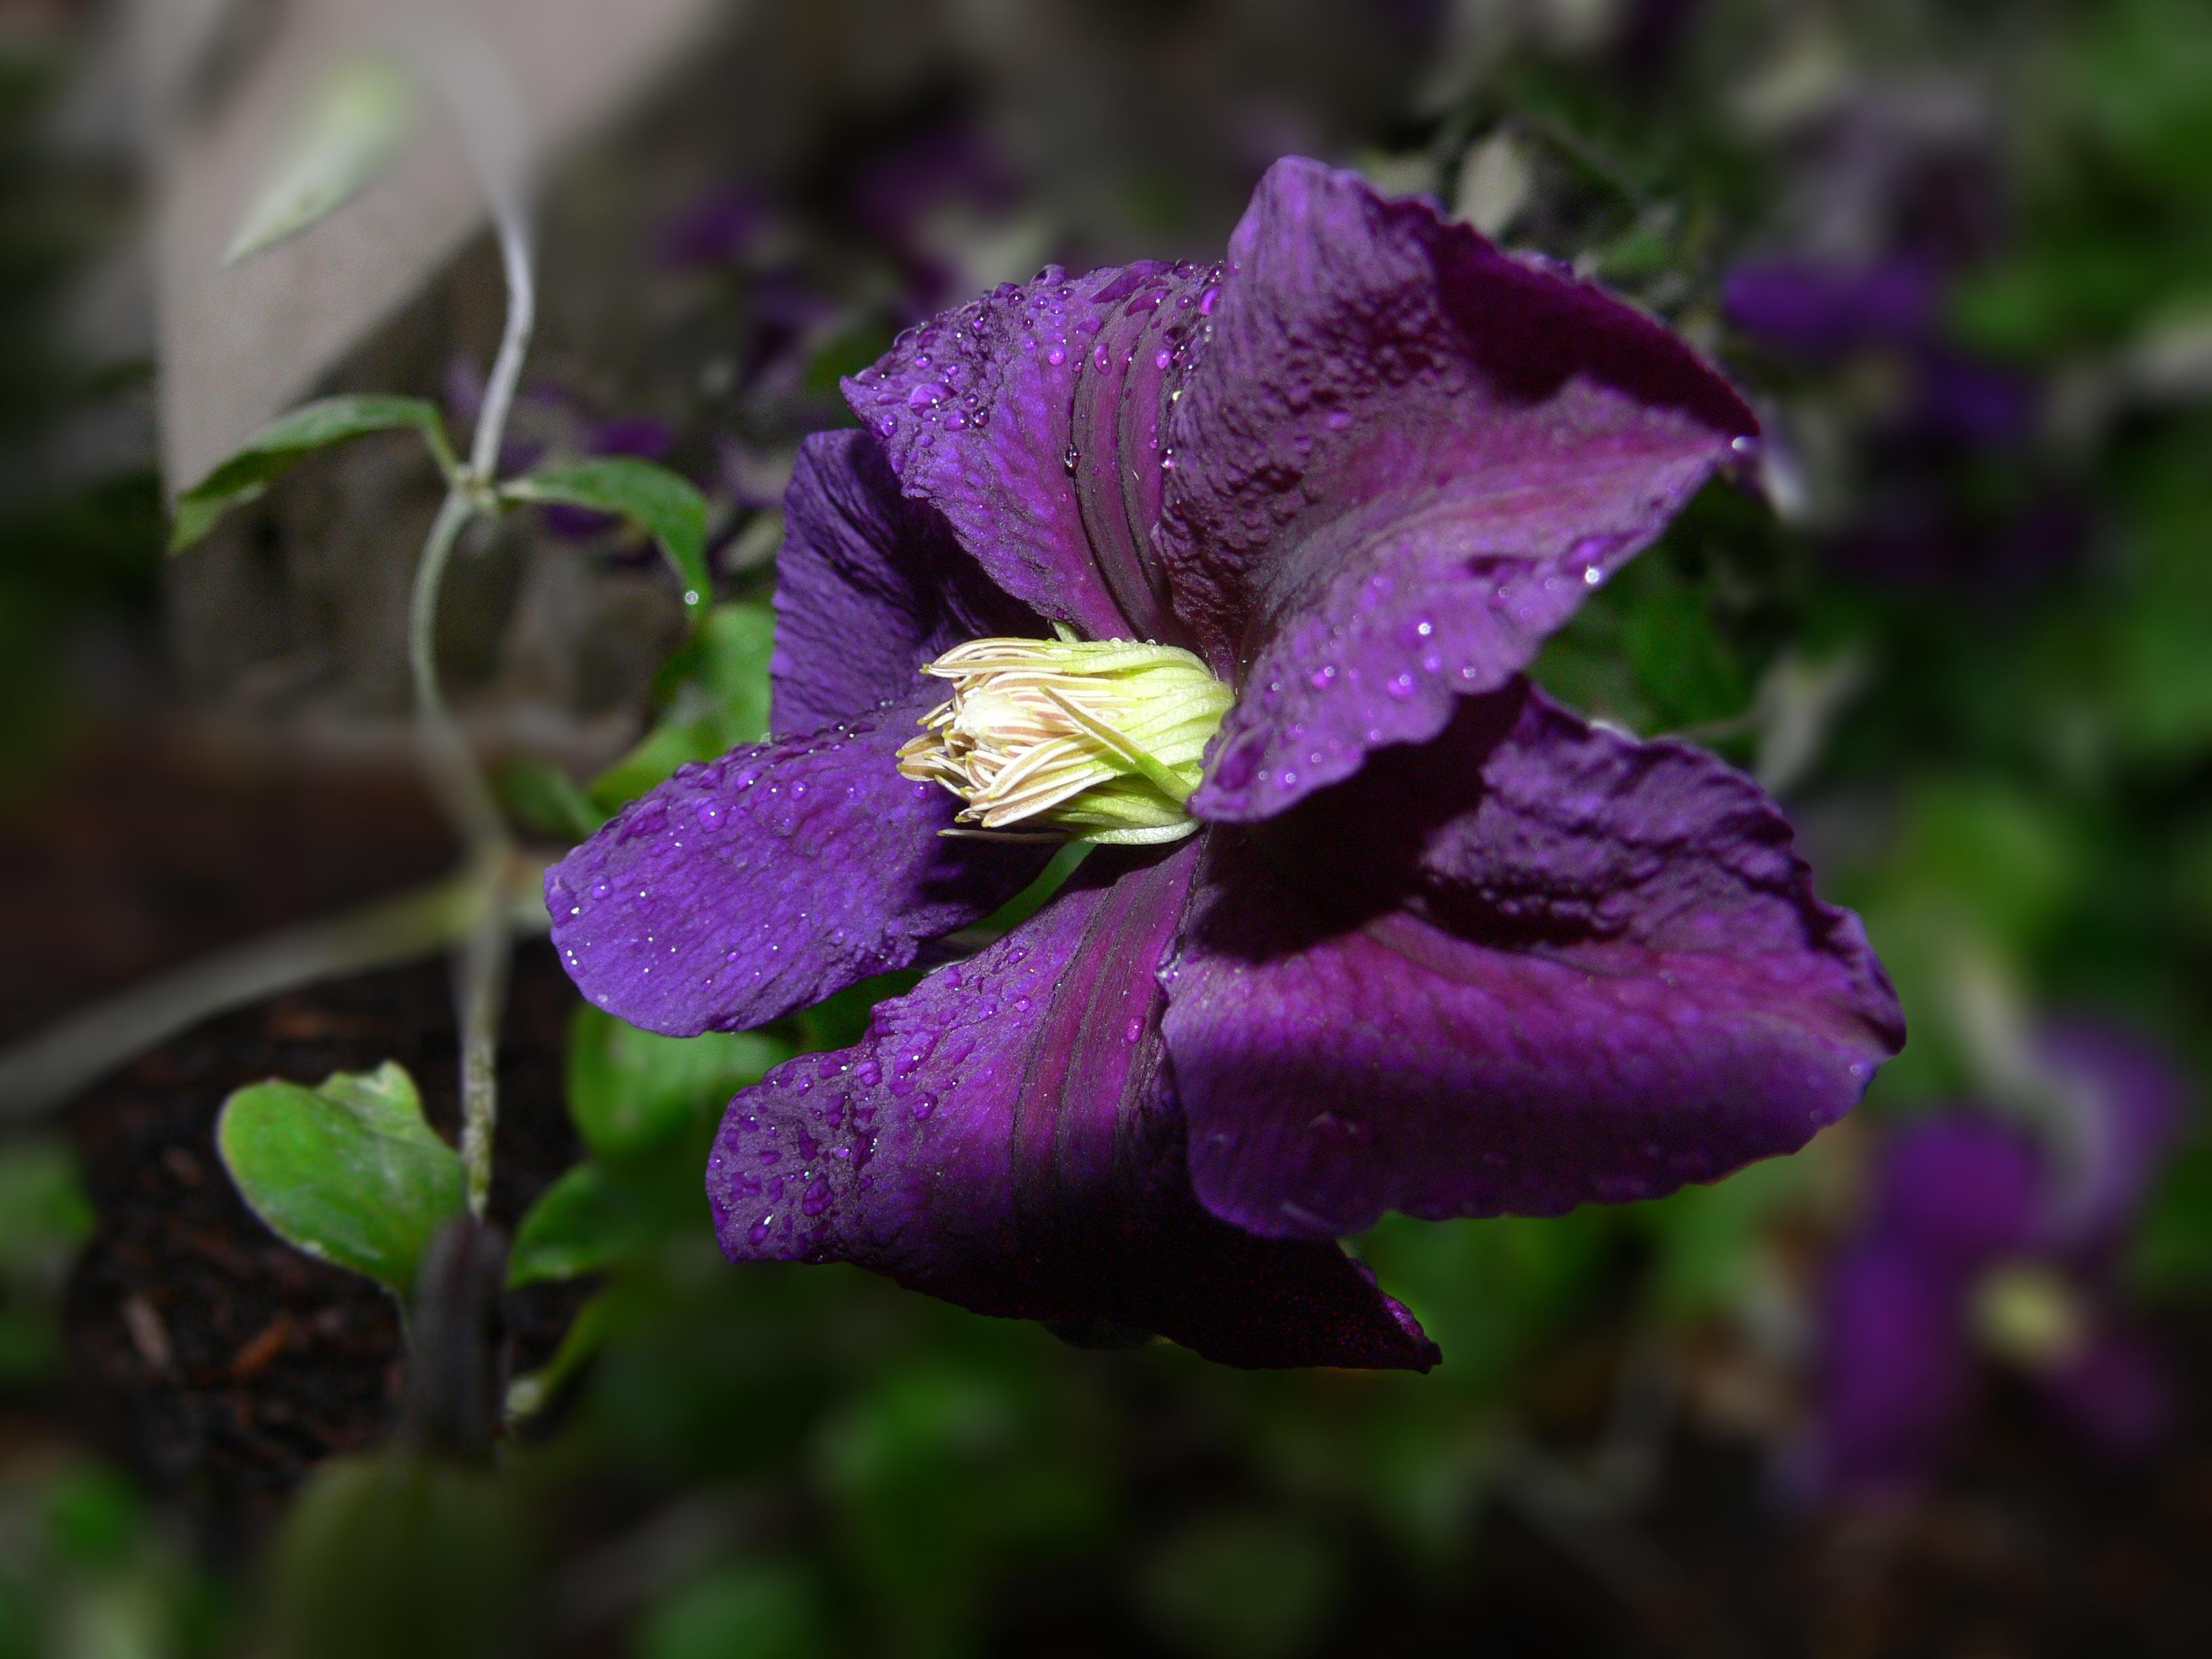 kostenlose foto natur bl hen wei blume lila bl tenblatt foto sommer busch. Black Bedroom Furniture Sets. Home Design Ideas